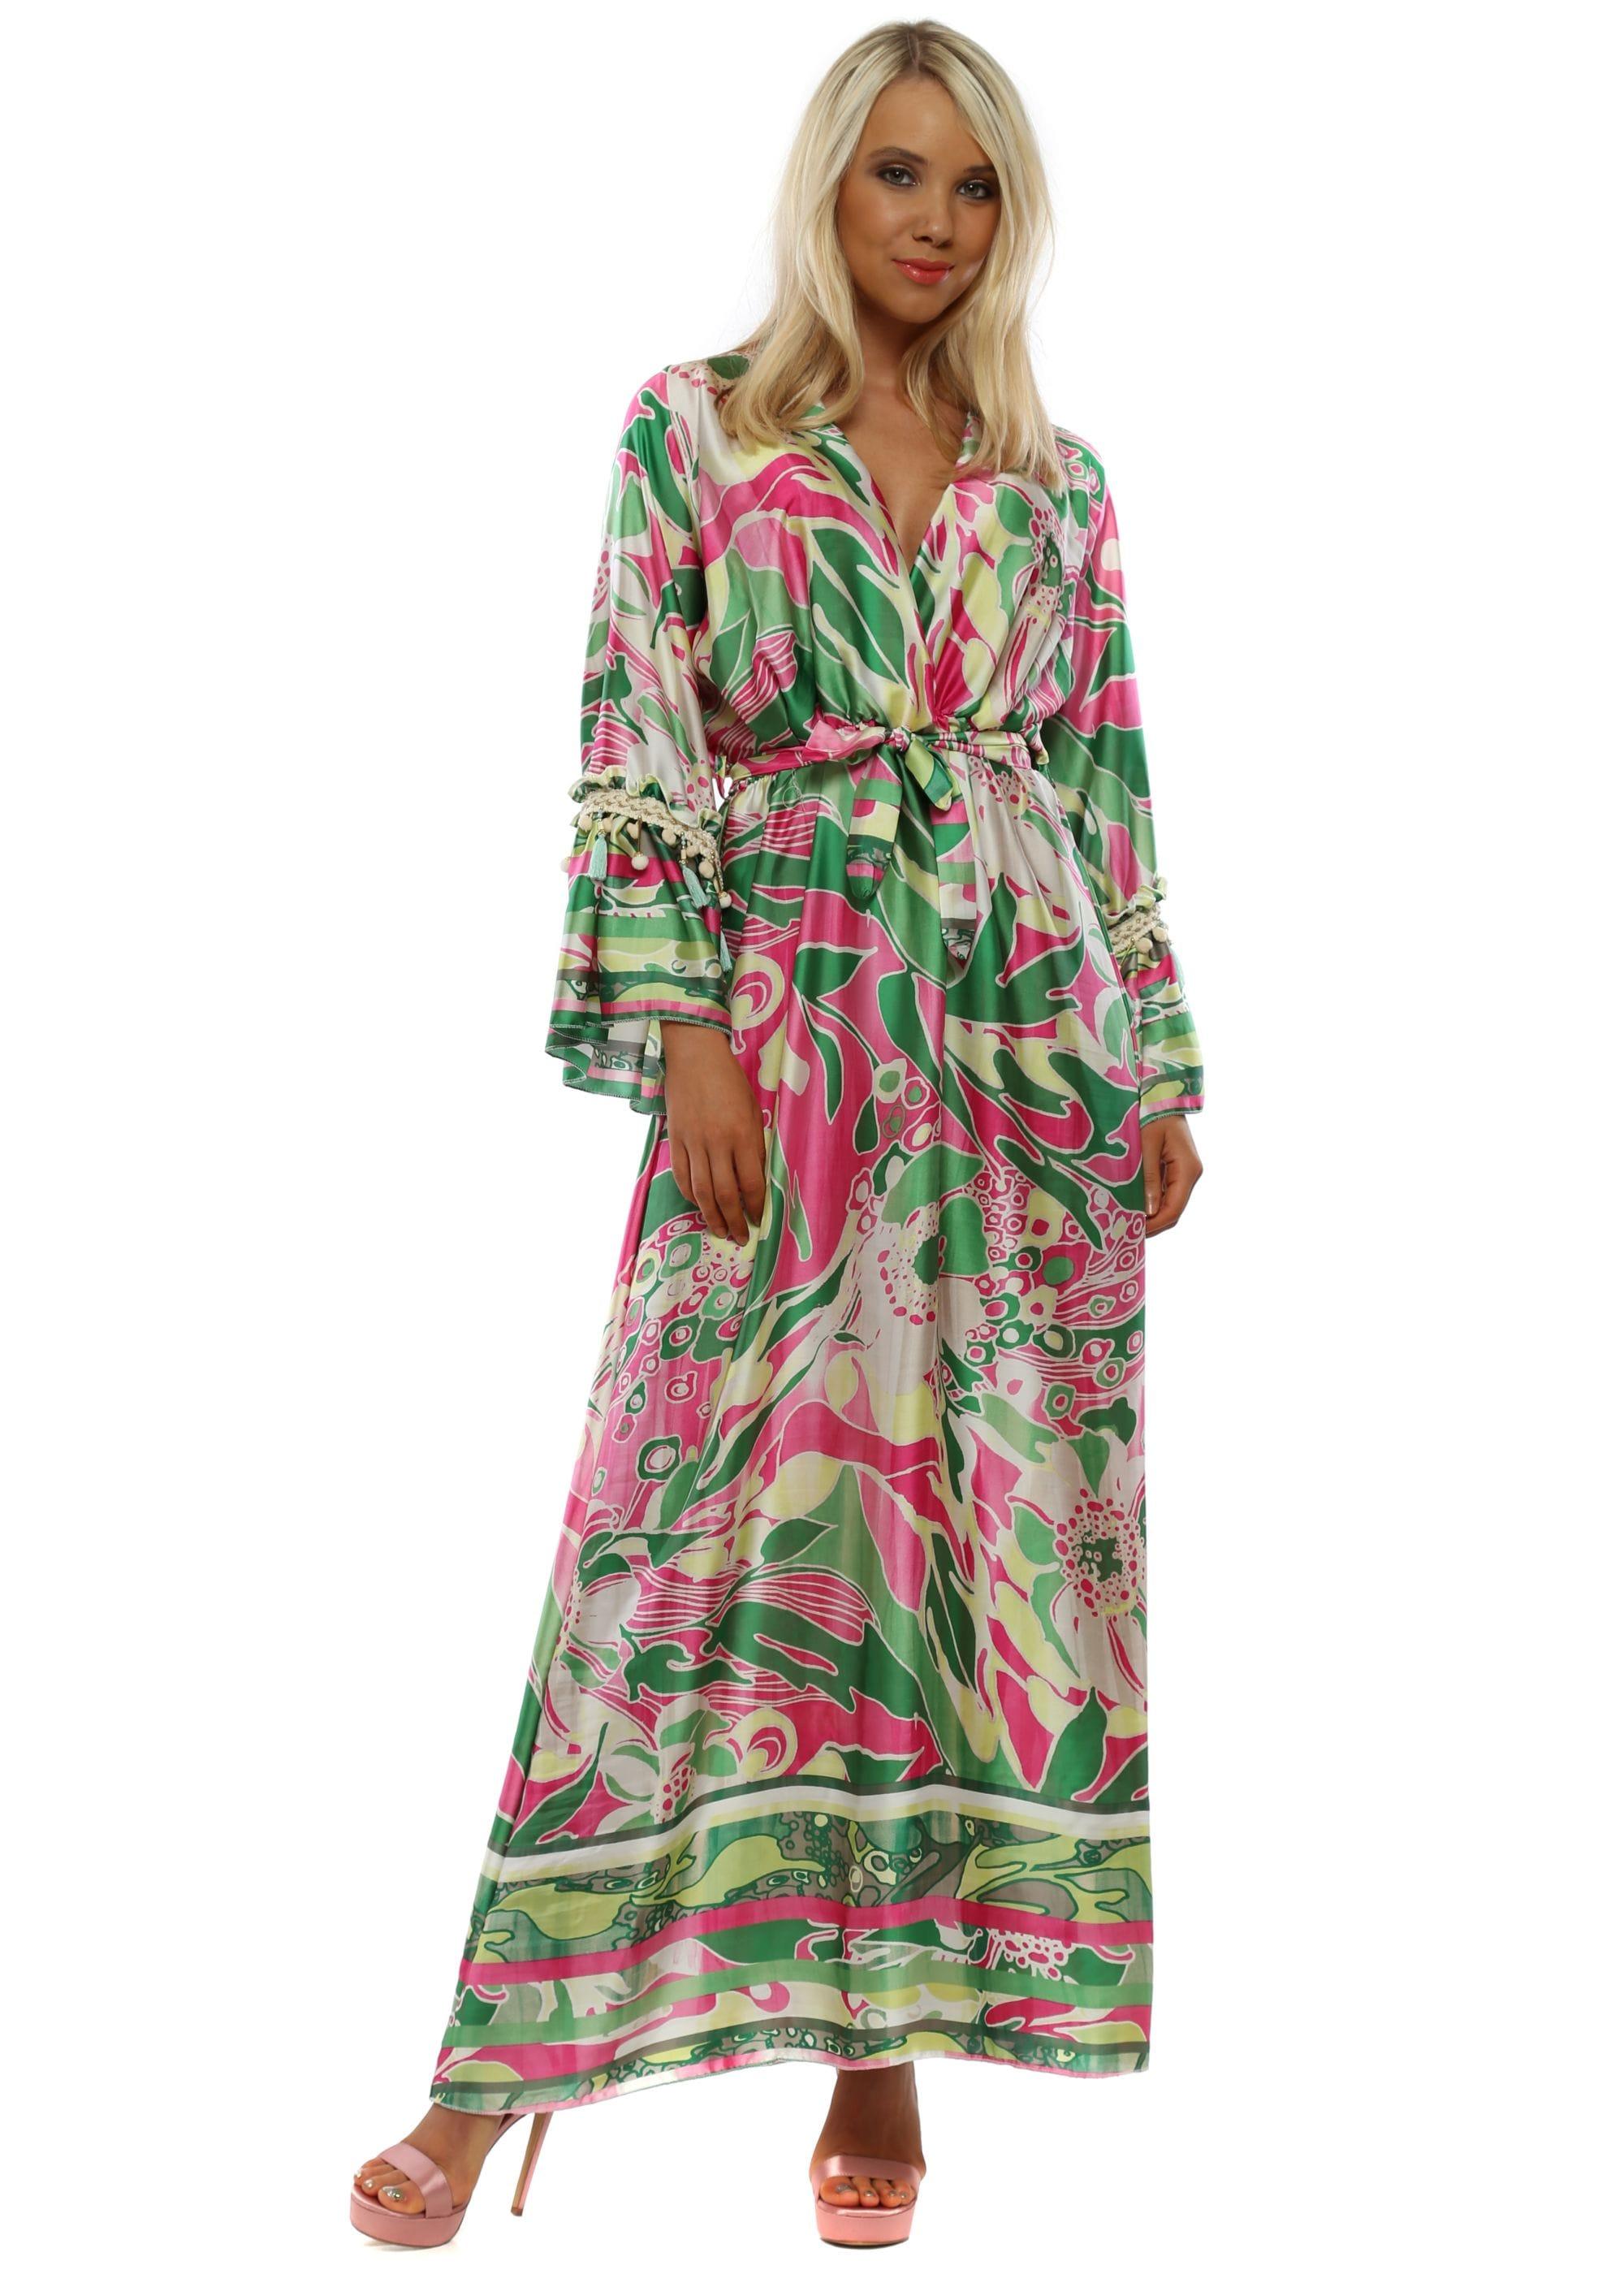 ea5db6f8cac Green  amp  Pink Long Sleeve Maxi Dress